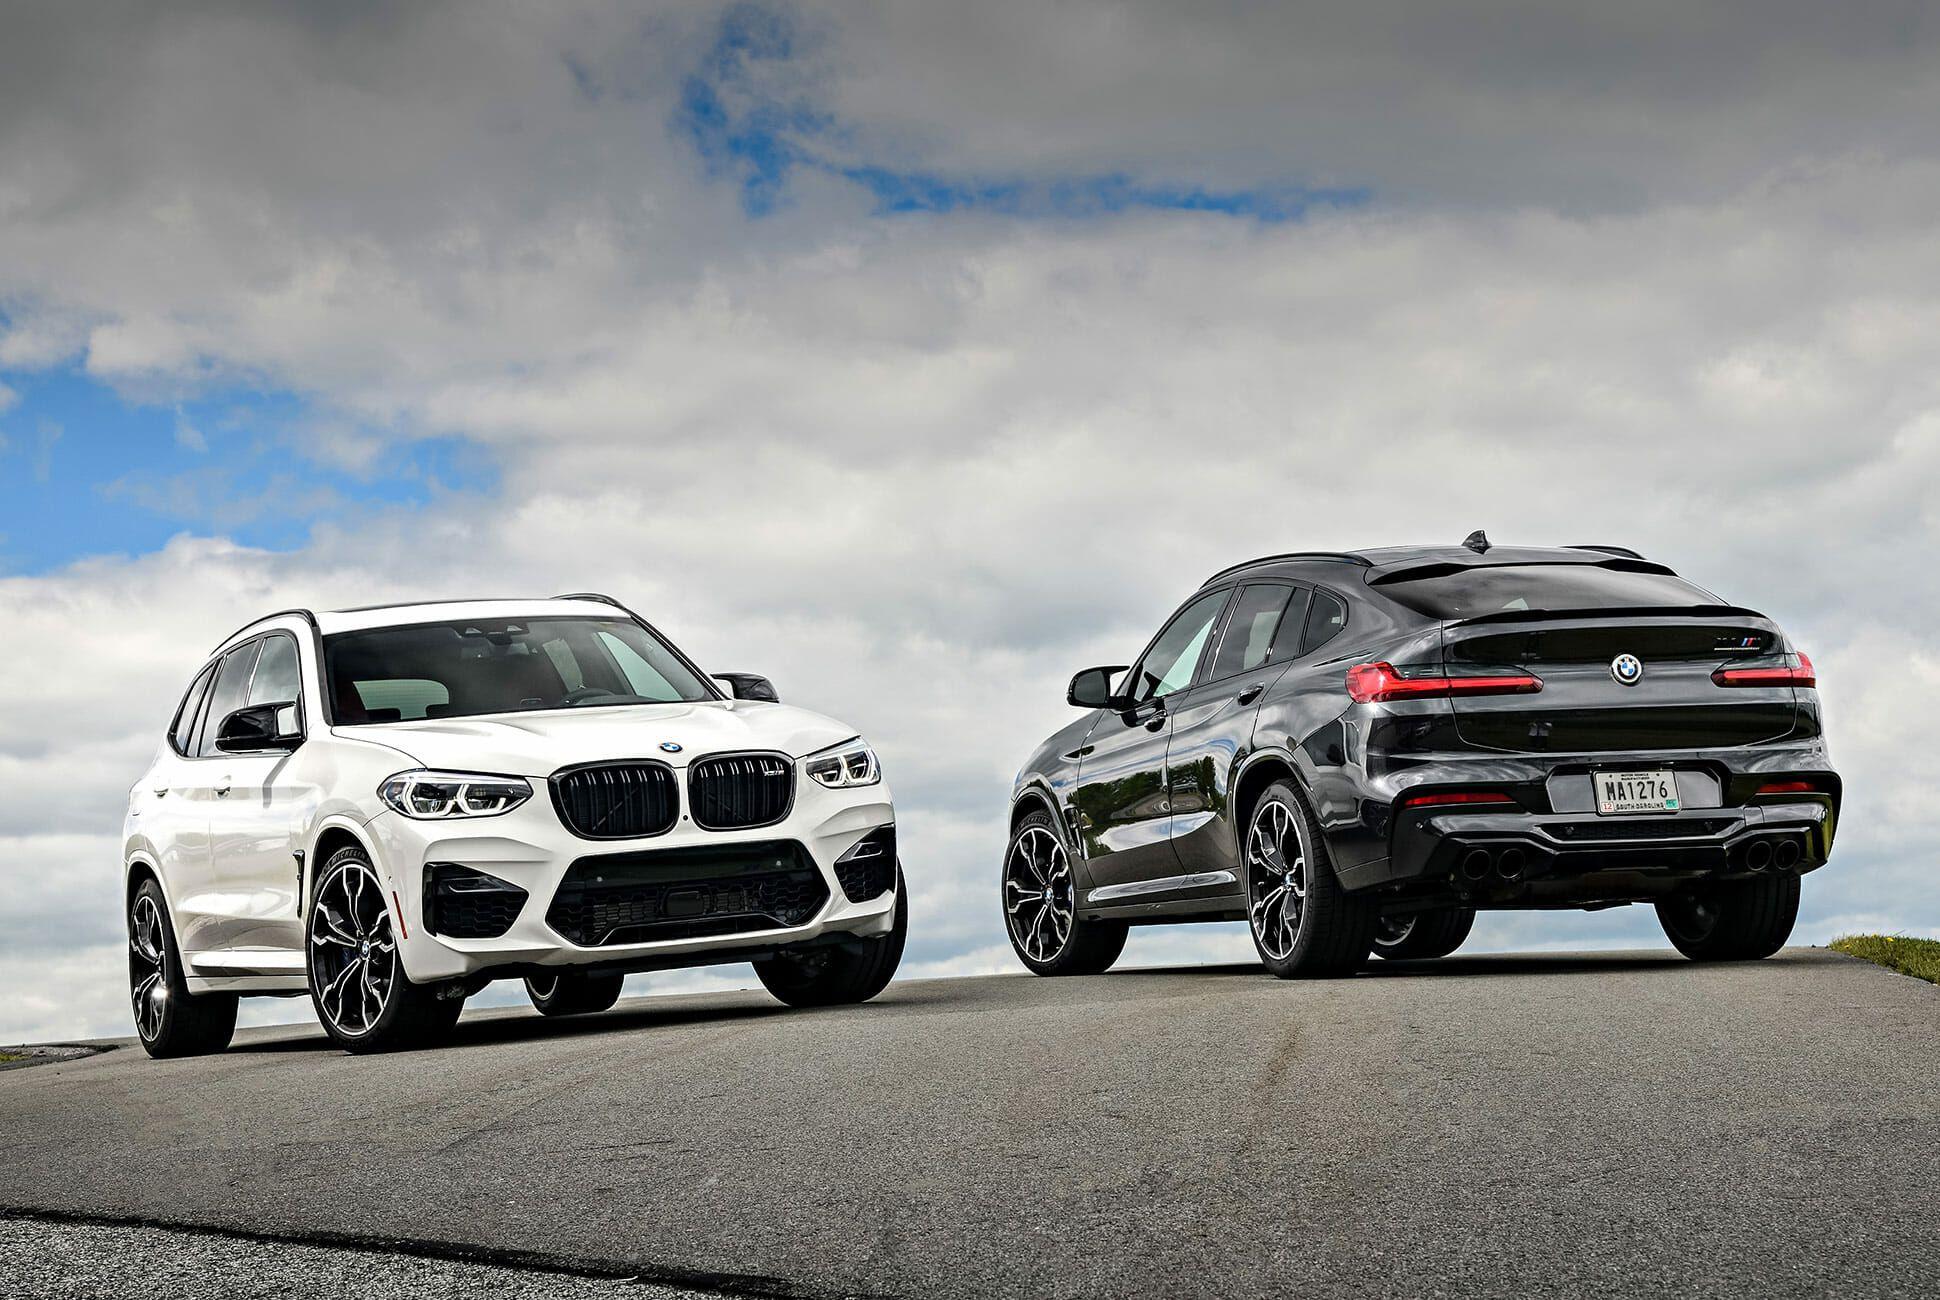 2020-BMW-X3-M-X4-M-Review-gear-patrol-slide-6